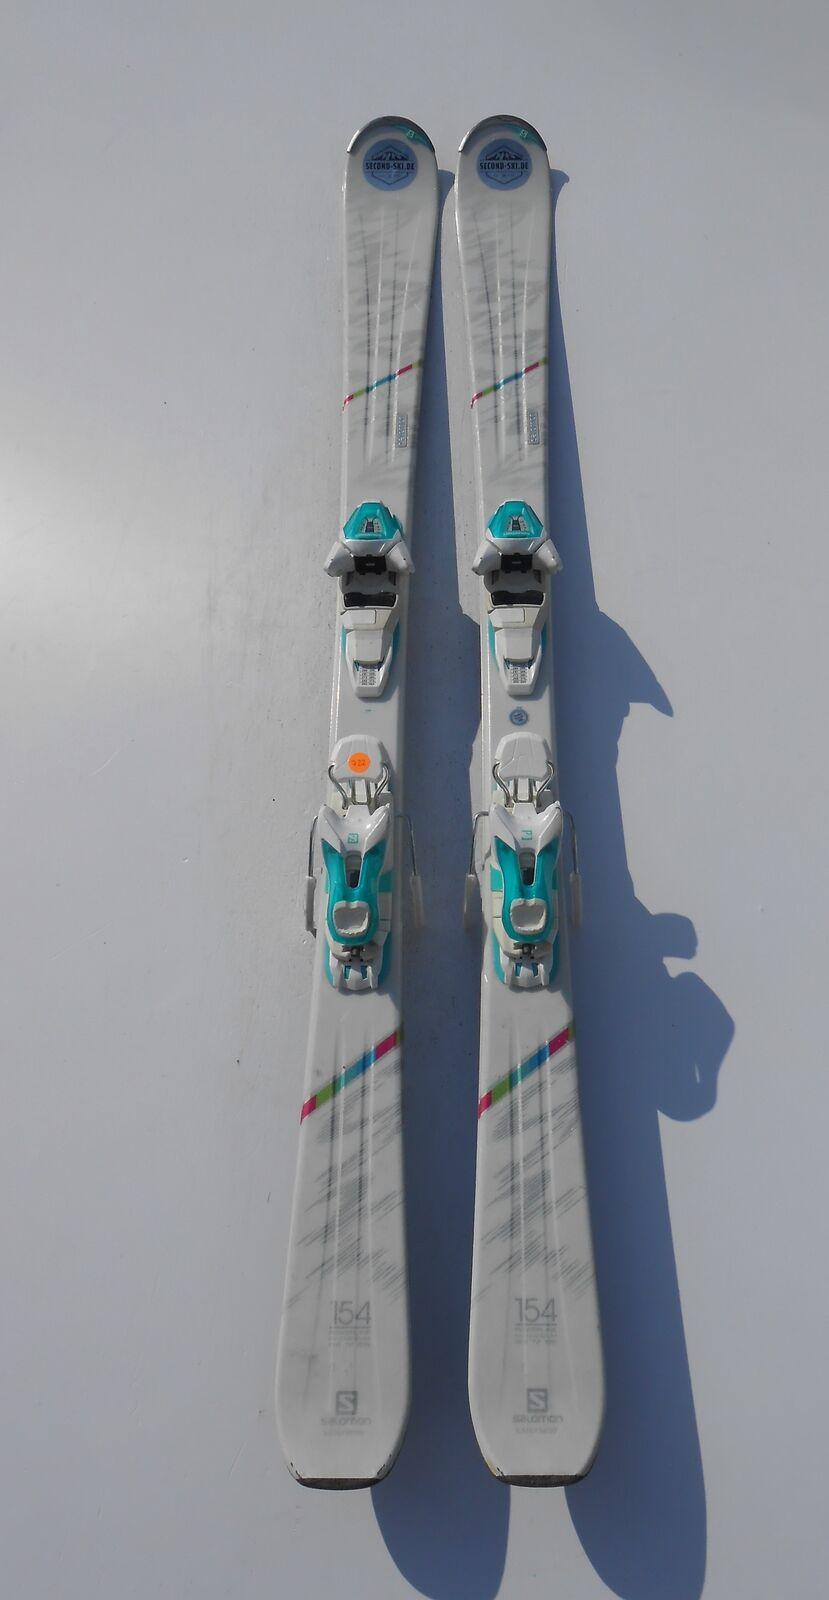 SALOMON W Pro Damen-Carving-Ski Länge 154cm (1,54m) inkl. Bindung Bindung Bindung   722 b9fe88